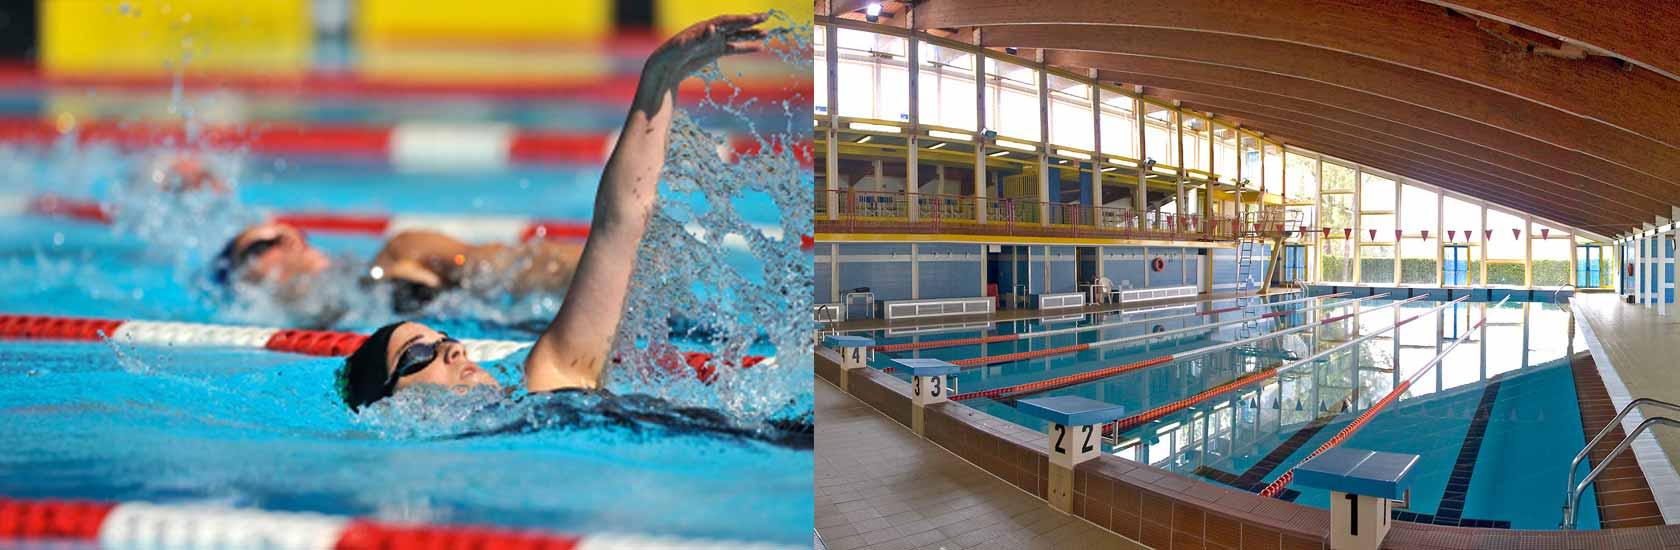 piscina-home